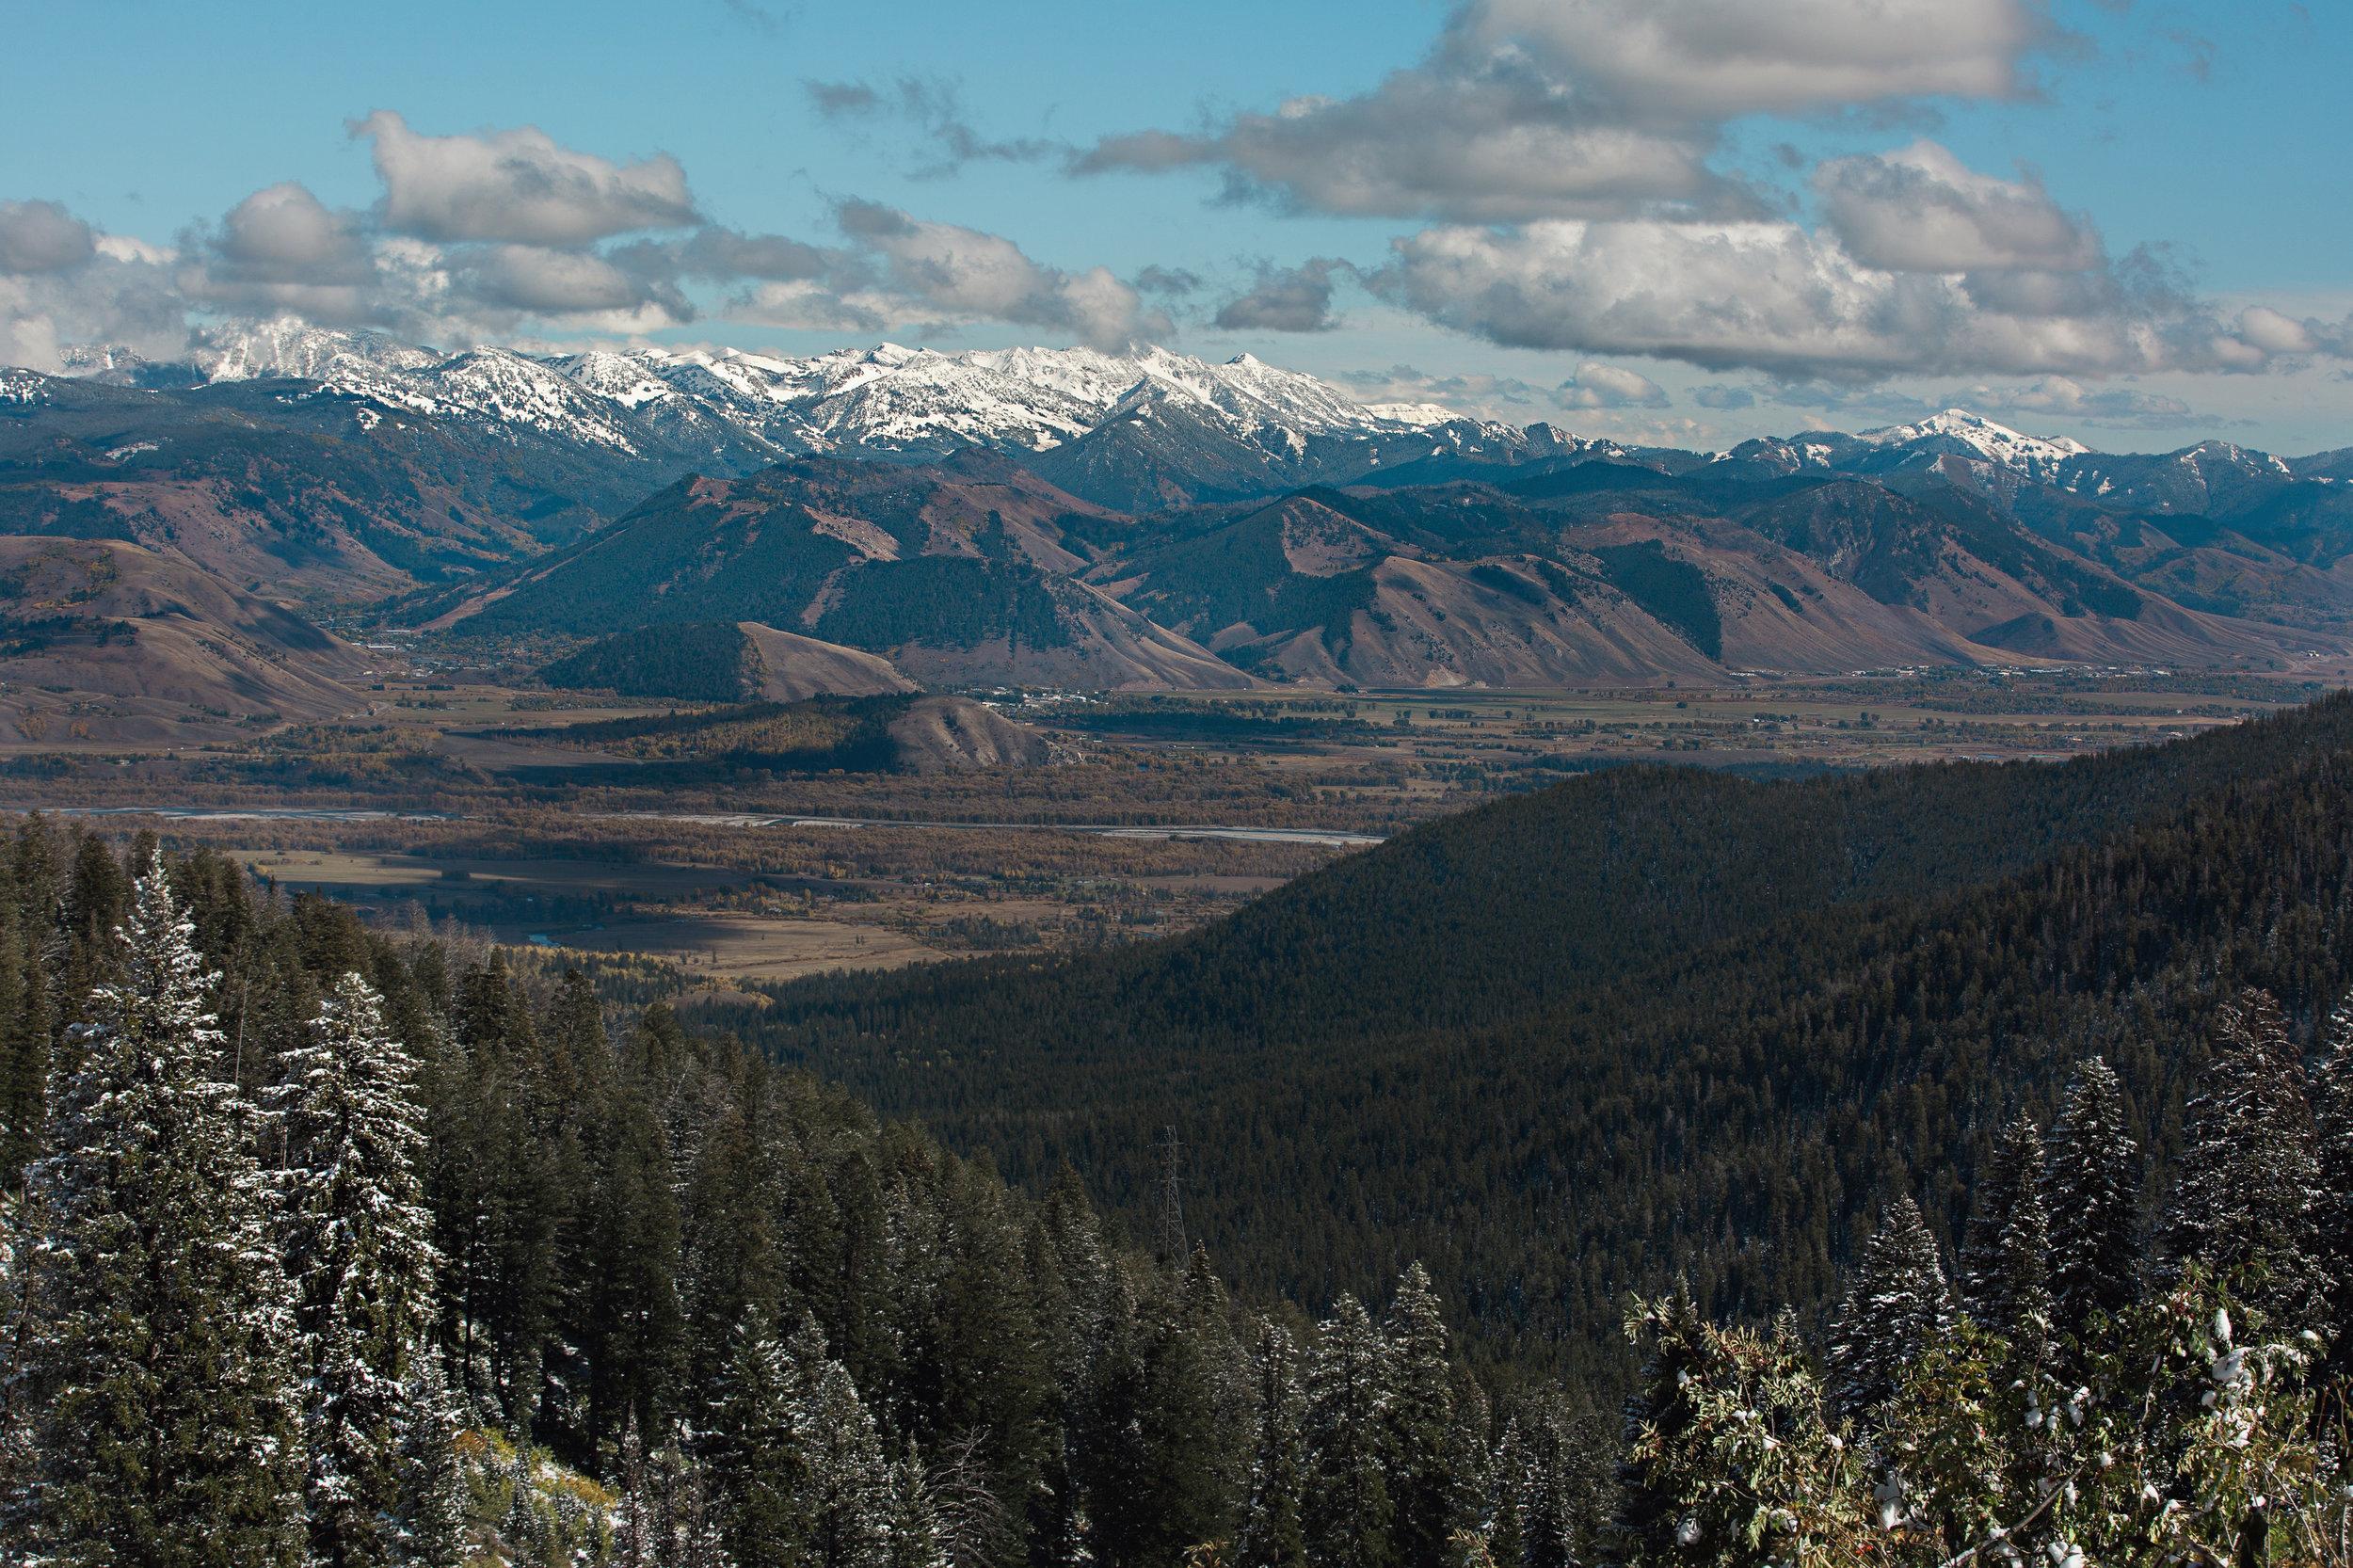 Cindy_Giovagnoli_Idaho_Wyoming_Grand_Teton_National_Park_autumn_aspens_camping_mountains-014.jpg